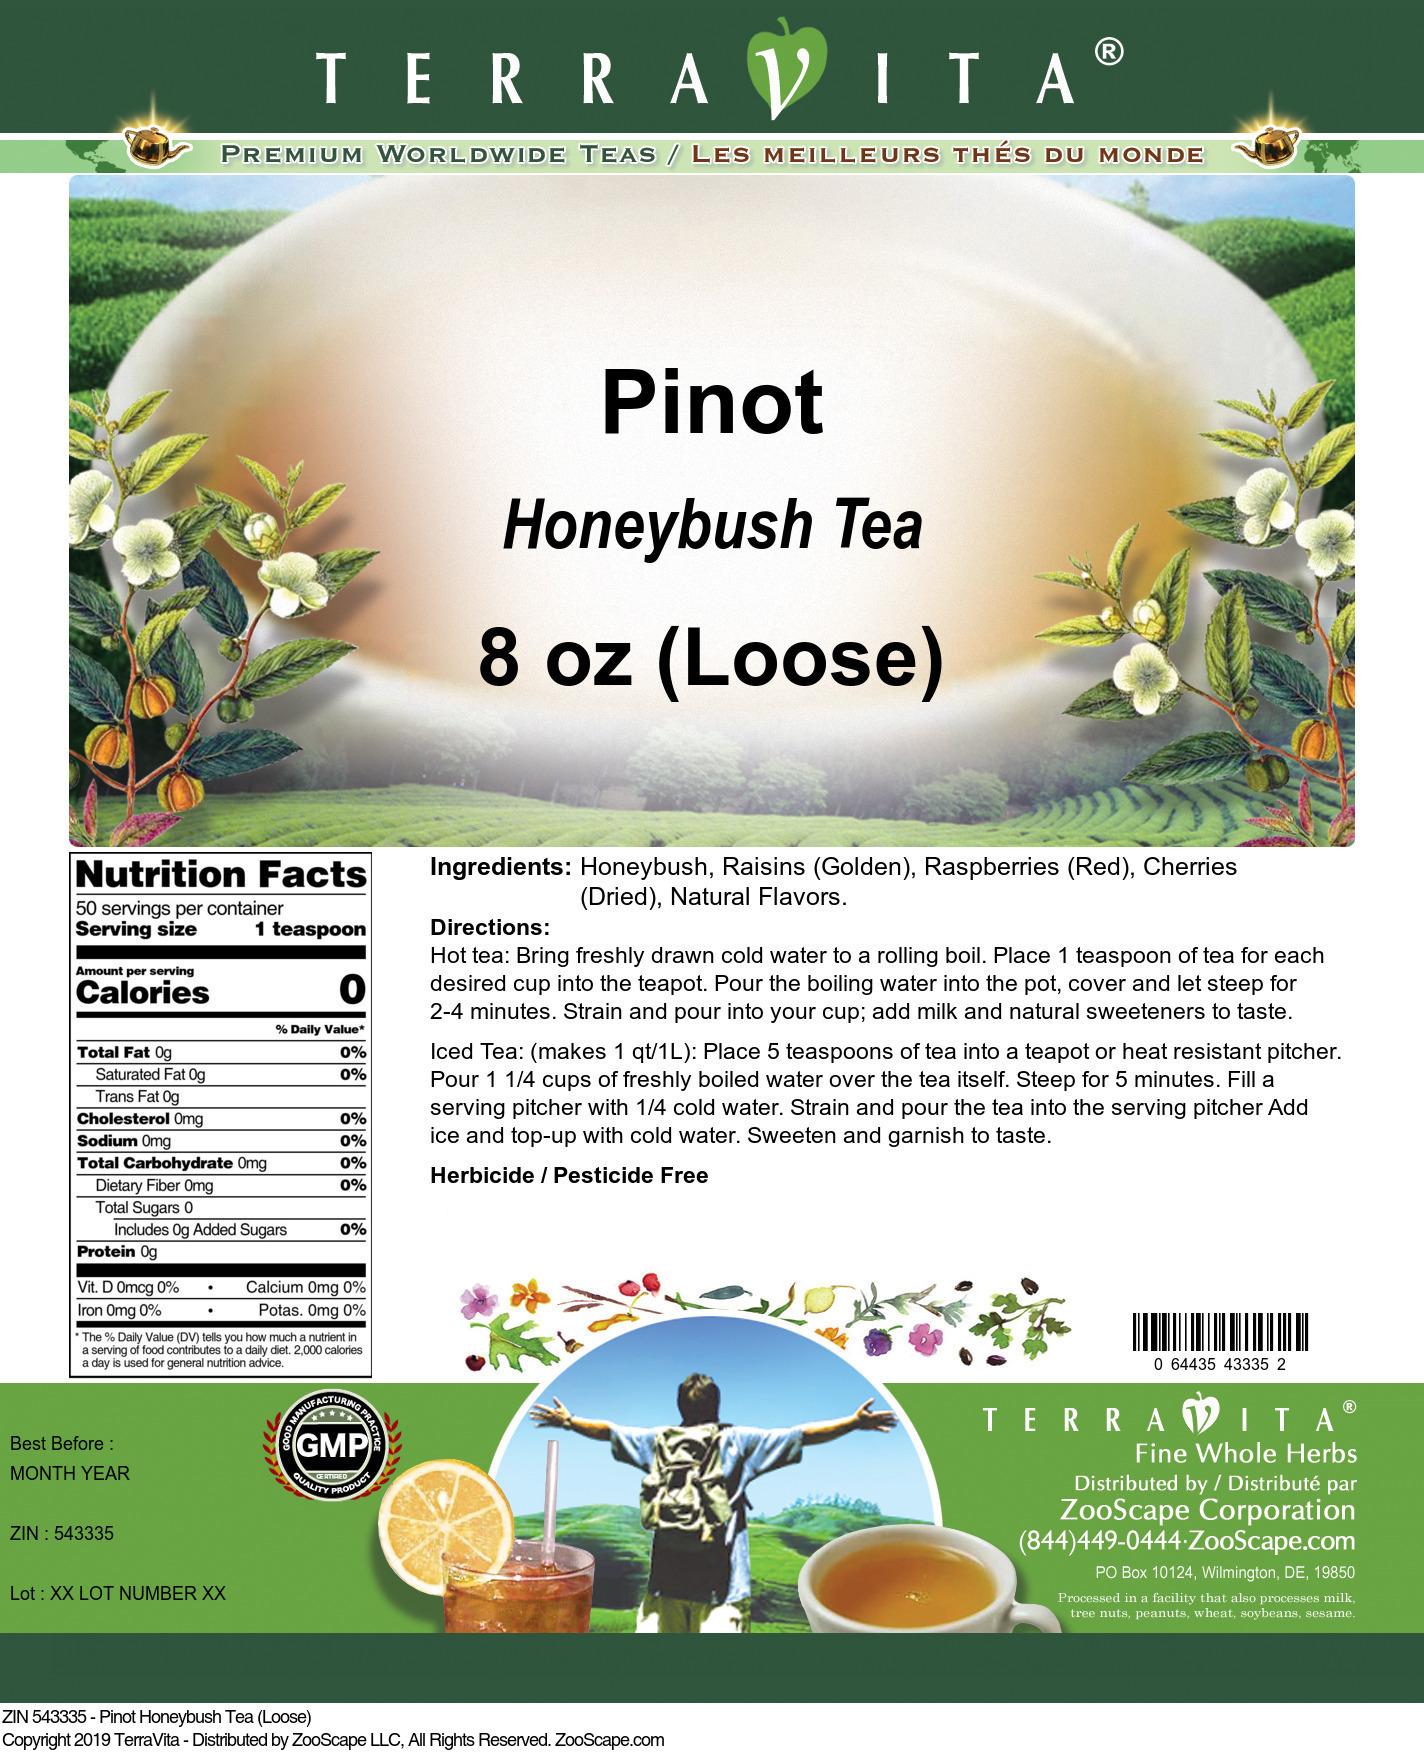 Pinot Honeybush Tea (Loose)